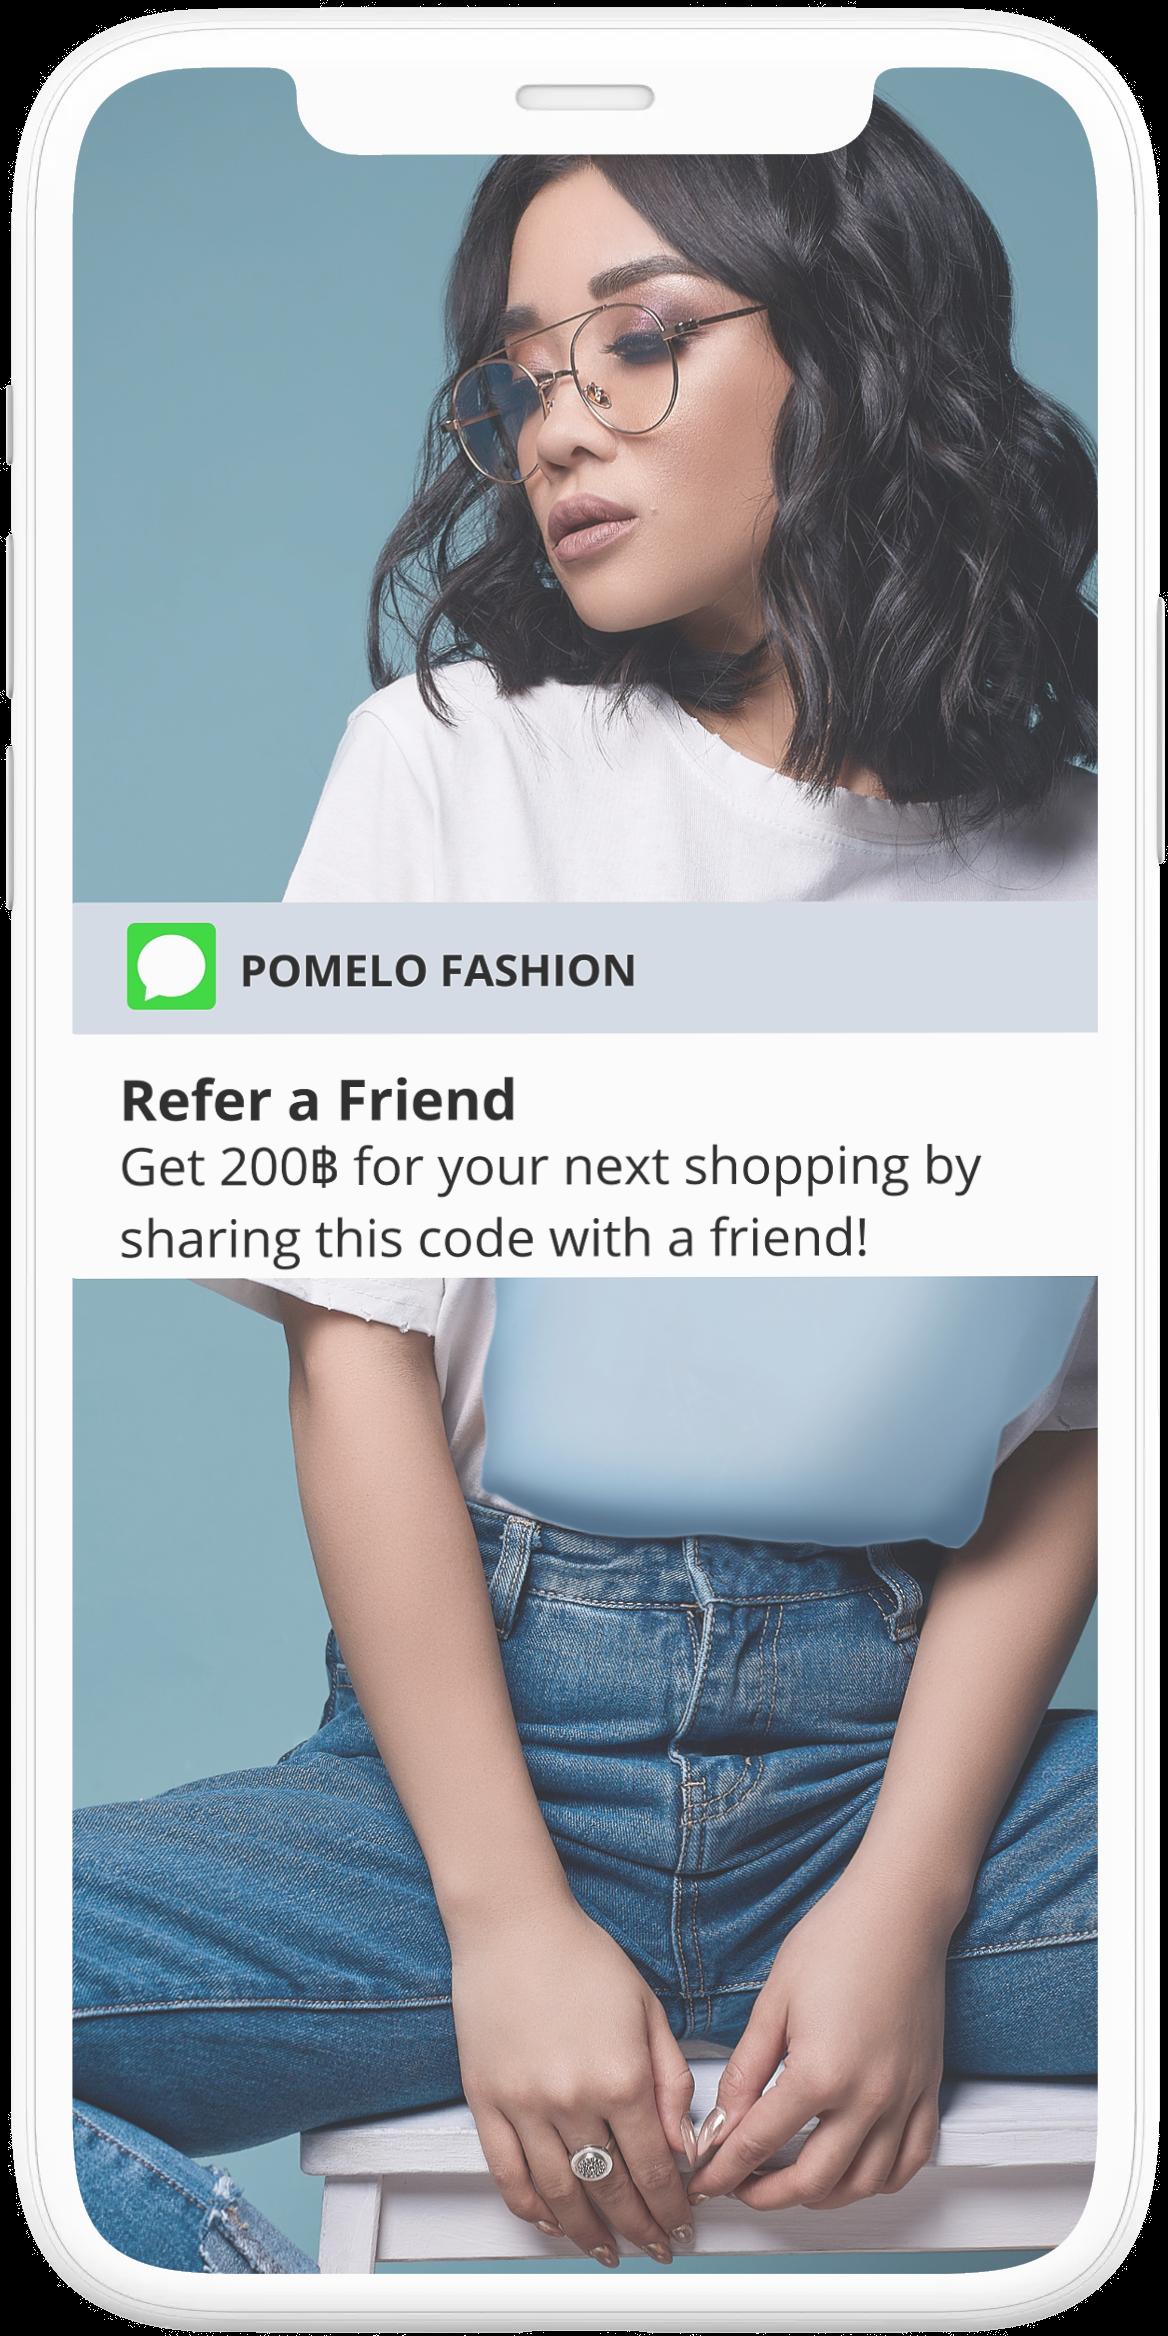 Pomelo Referral Program Customization and Branding